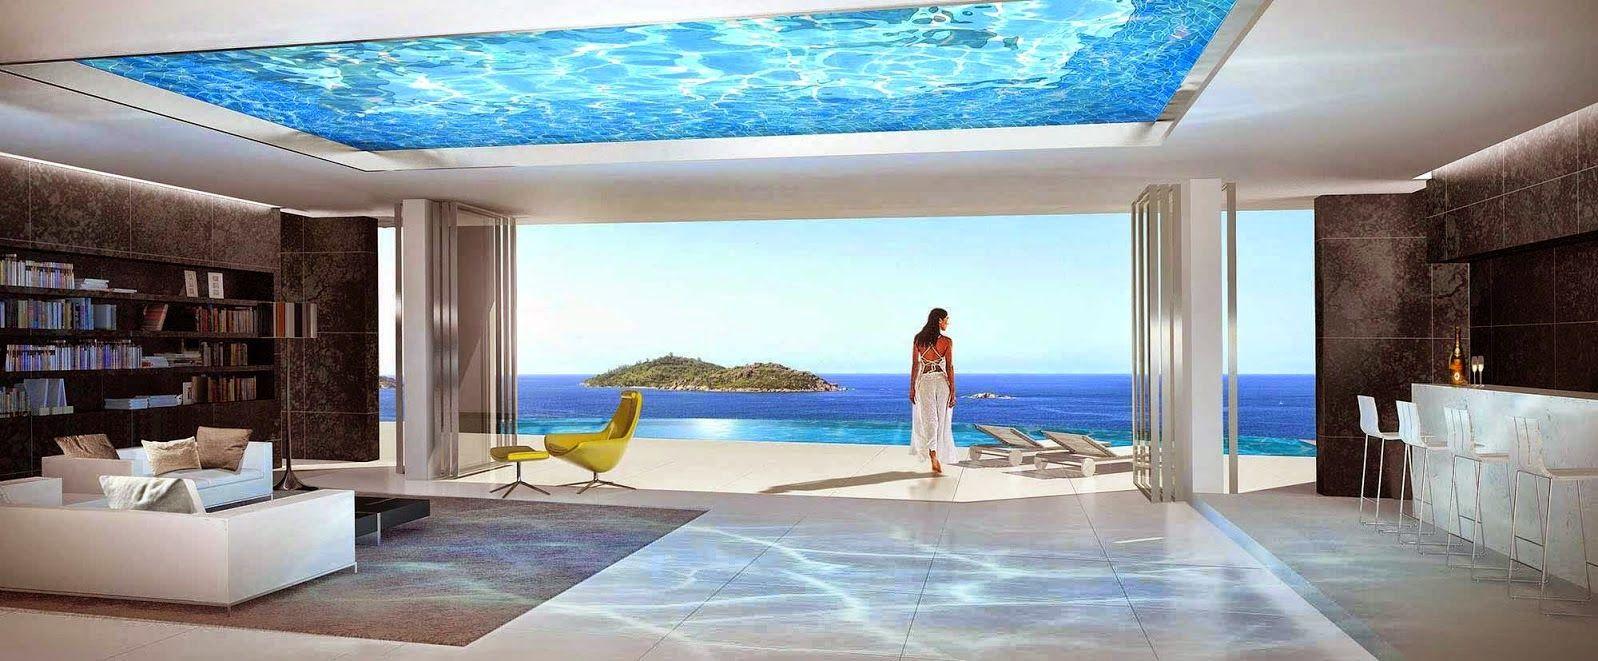 Pics for inside million dollar beach homes - Inside luxury beach homes ...